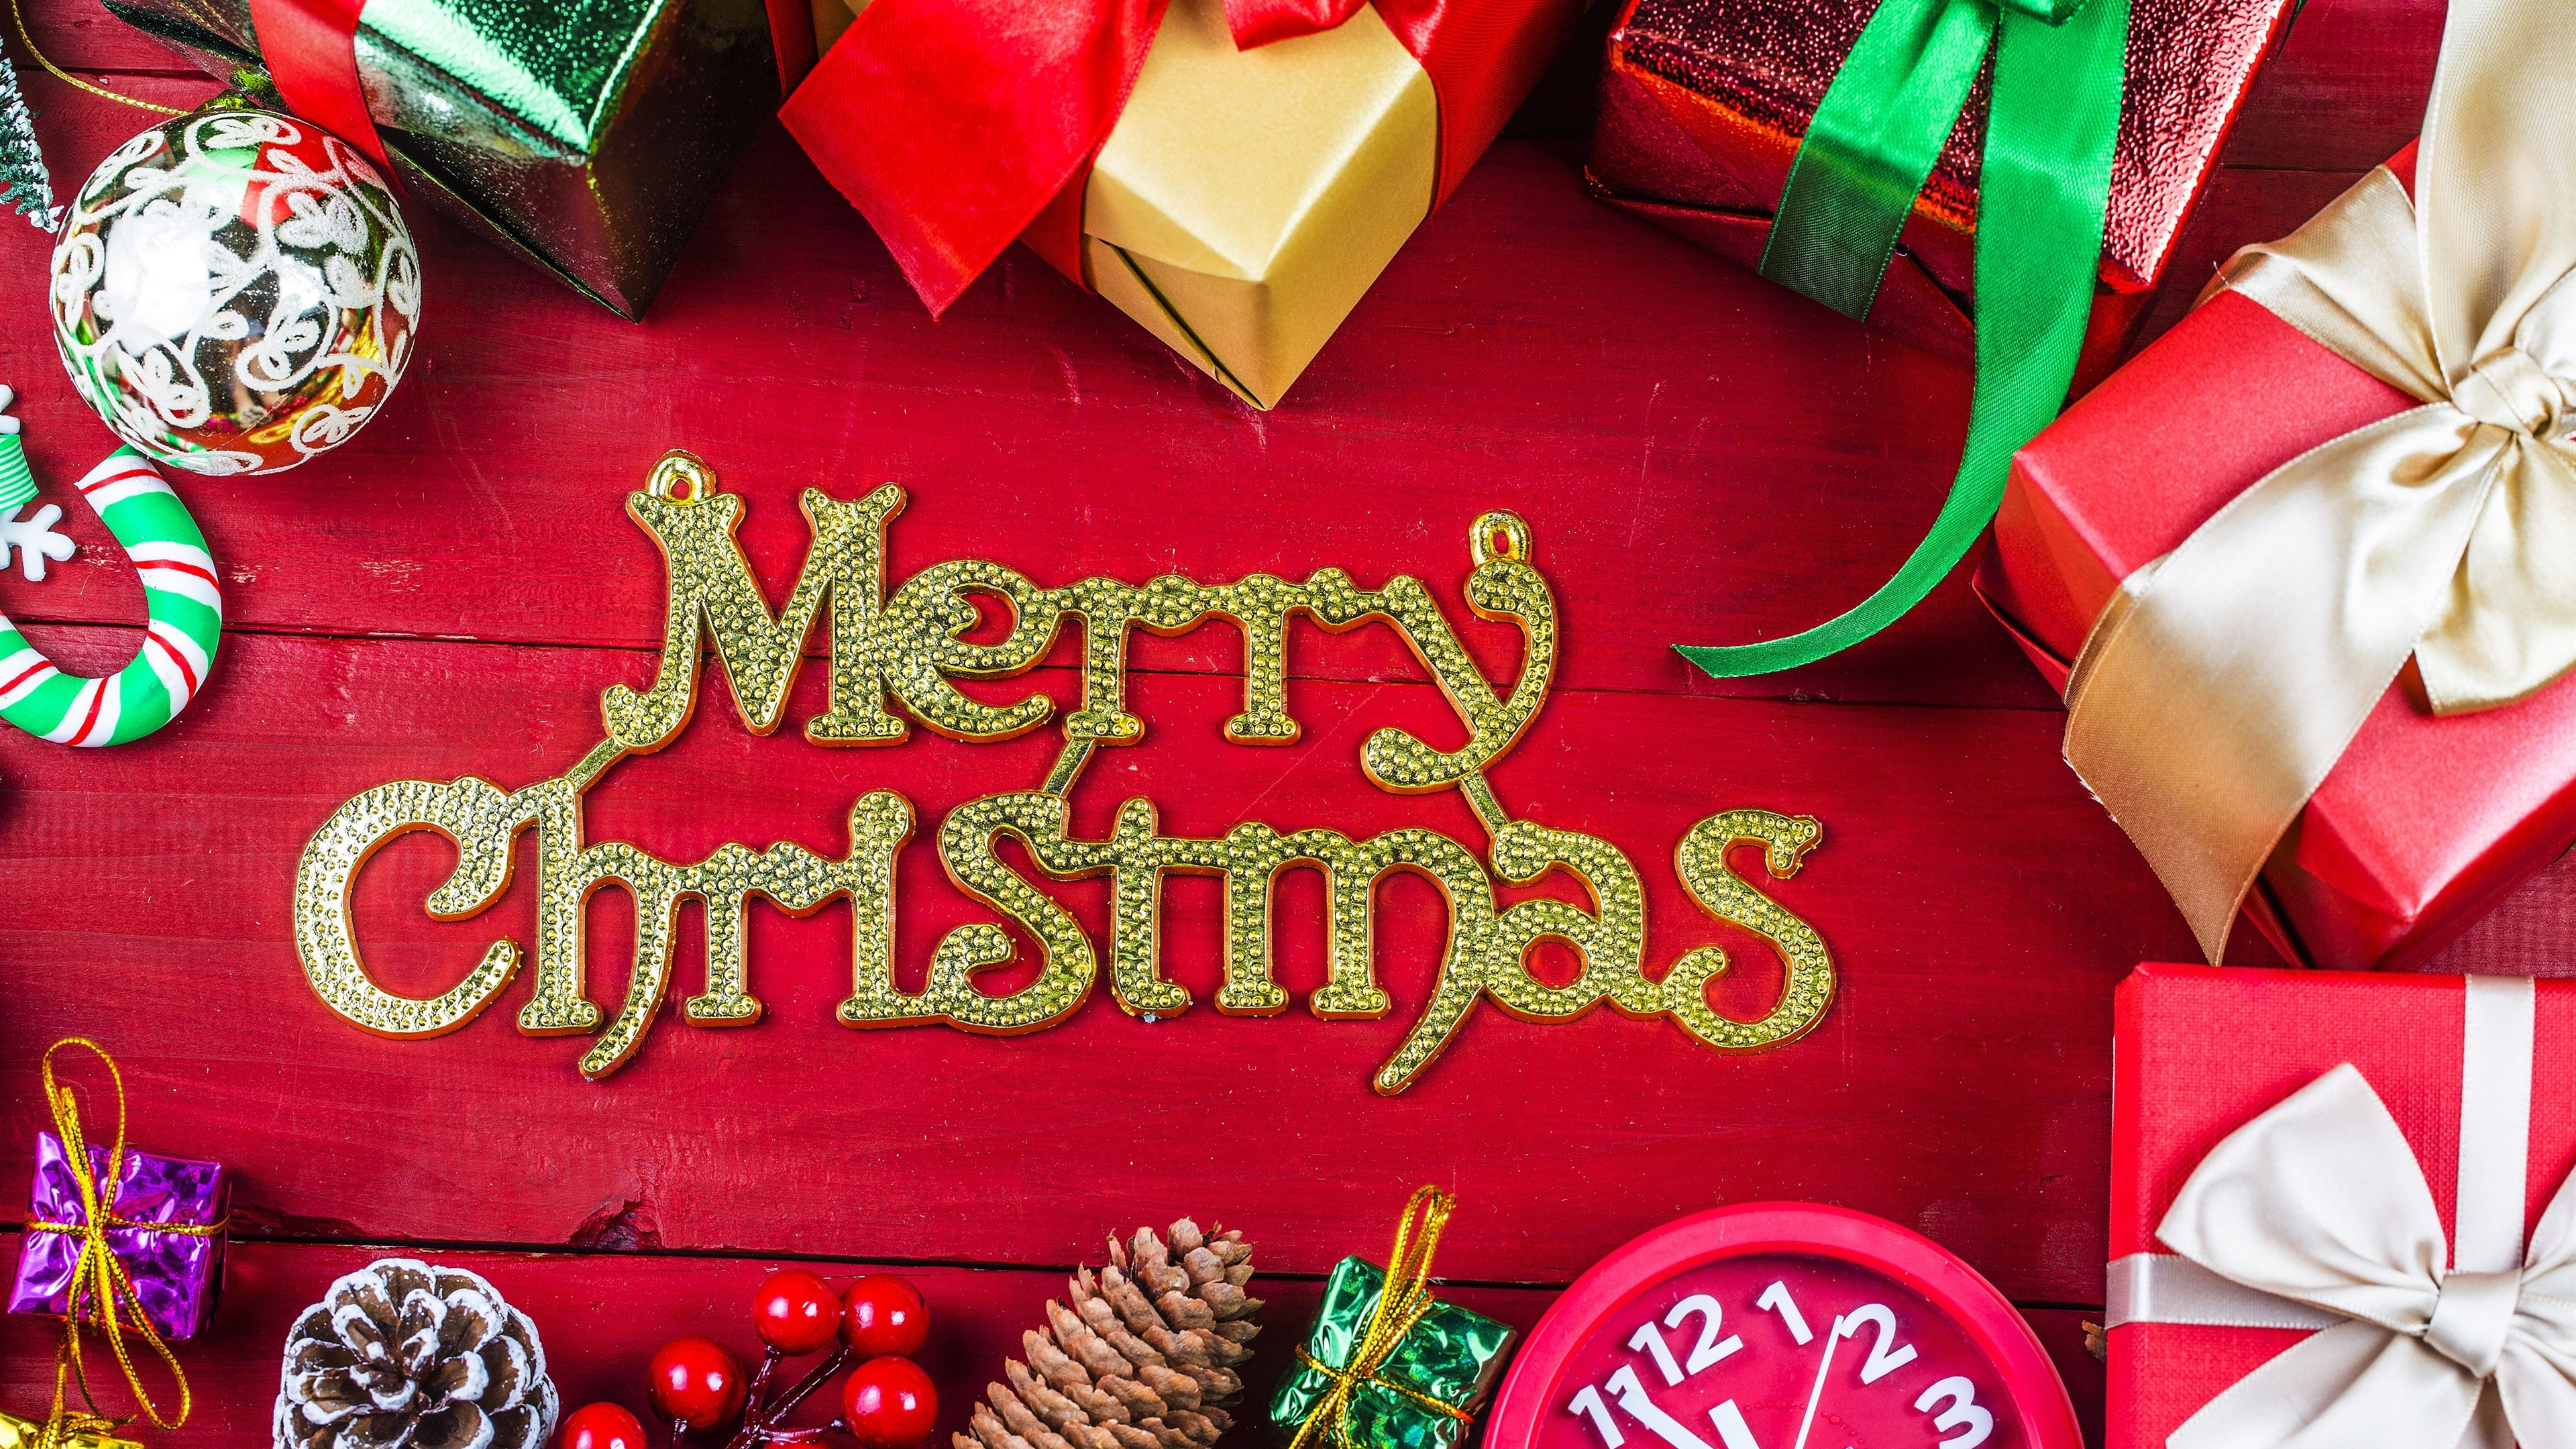 4k Merry Christmas Best Hd Wallpaper   3840x2160   Download HD 3840x2160